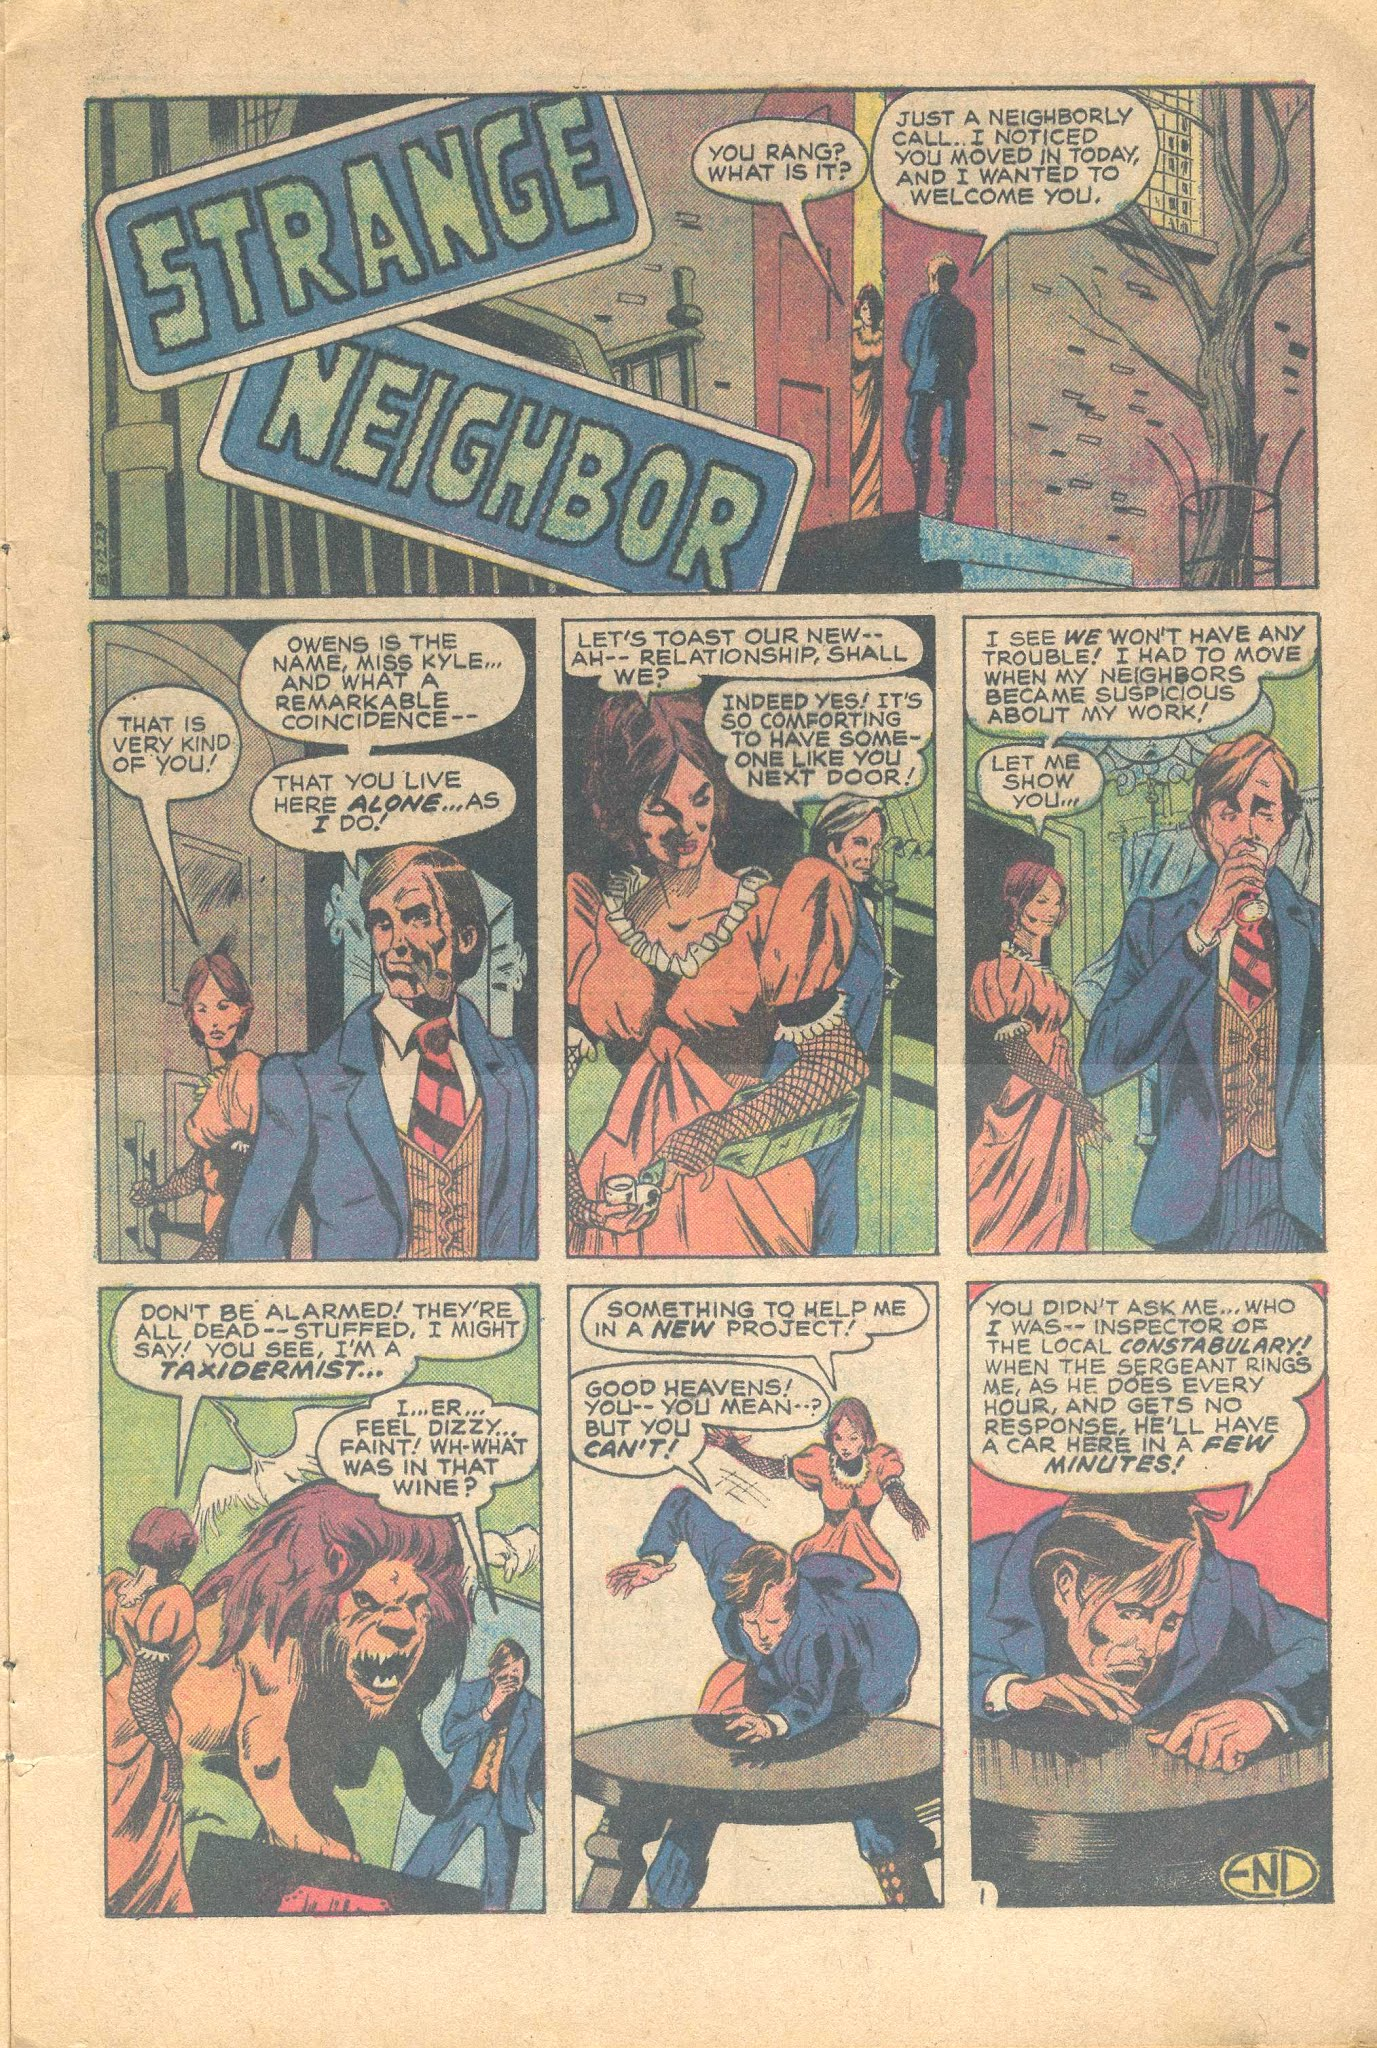 Secrets of Sinister House (1972) #17 pg11, art by Howard Chaykin.